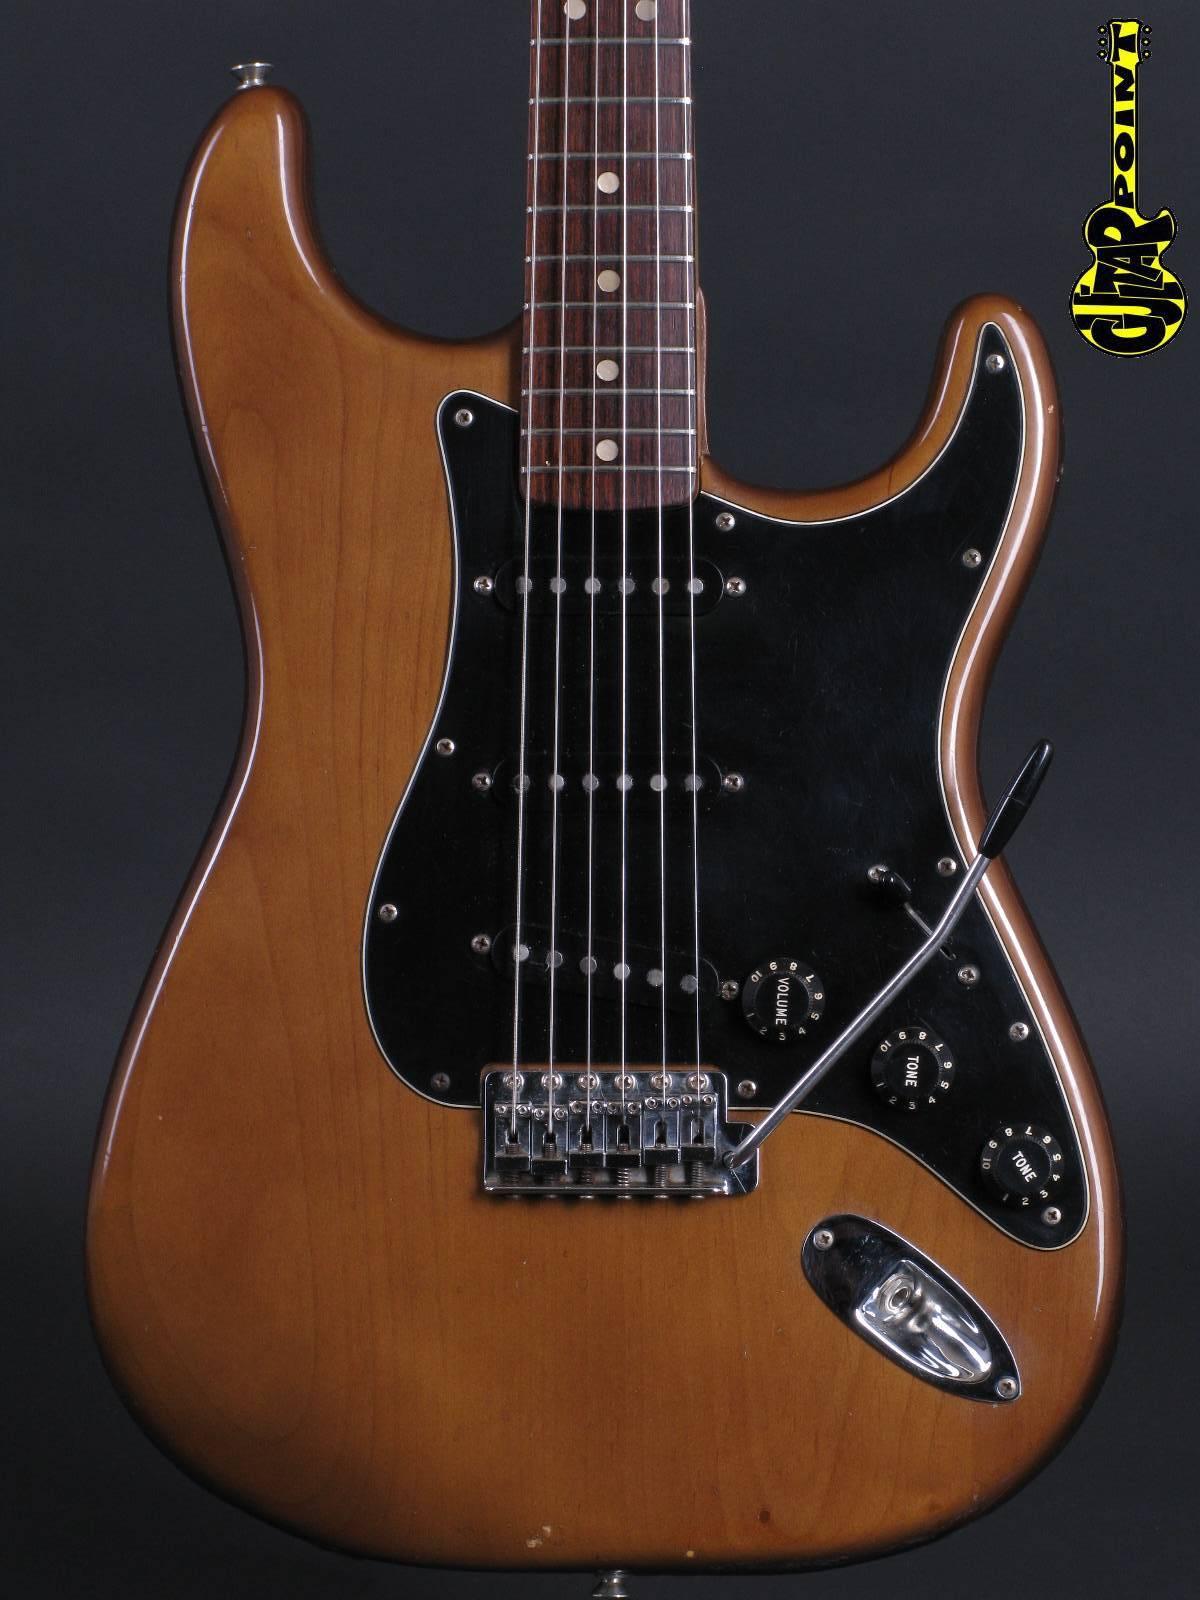 1974 Fender Stratocaster - Walnut